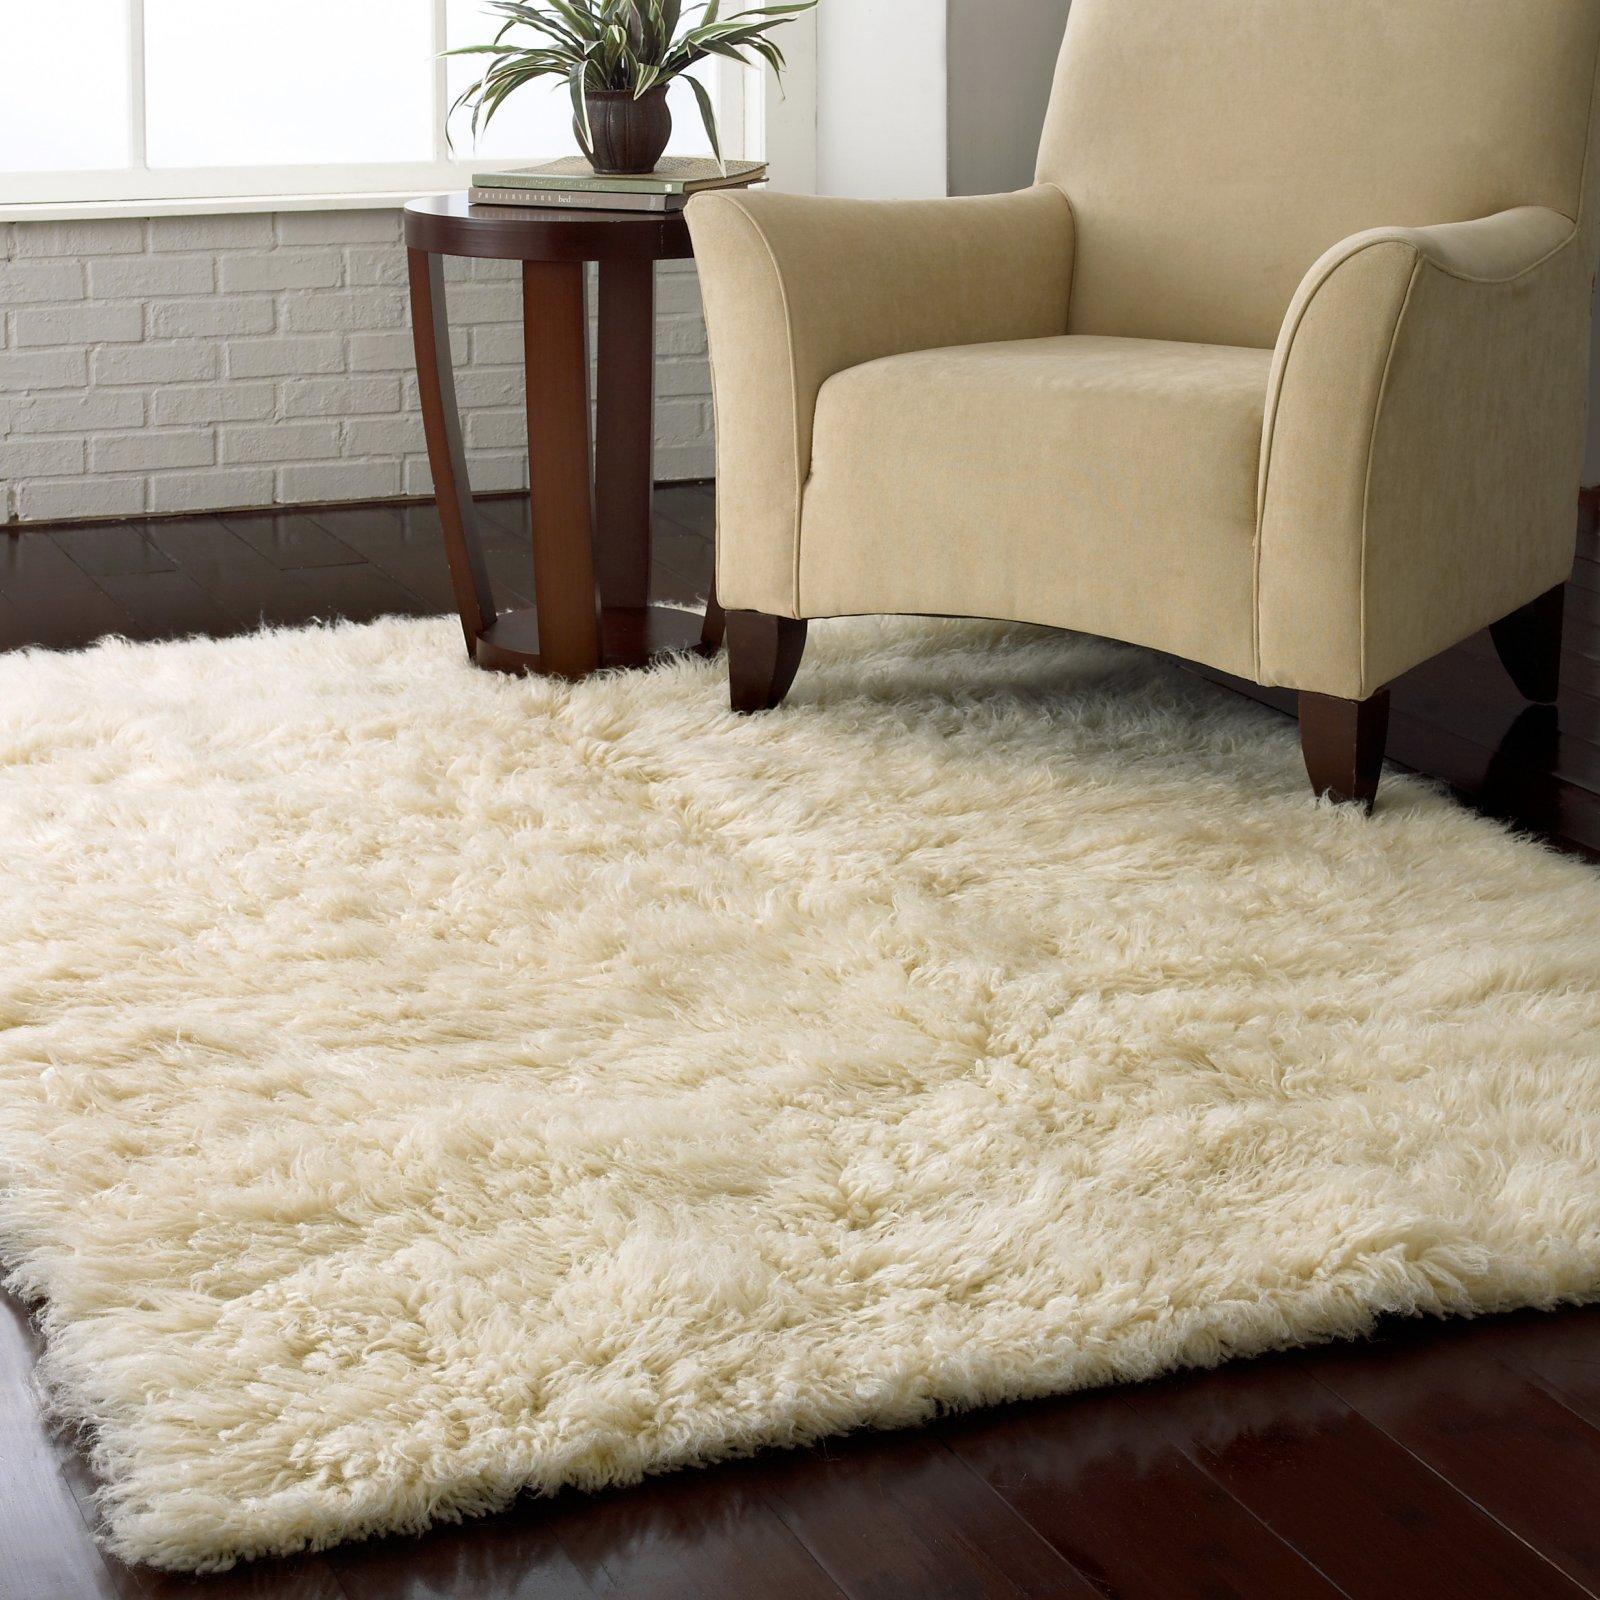 Popular Flokati Shag Rug - Natural plush area rugs for living room